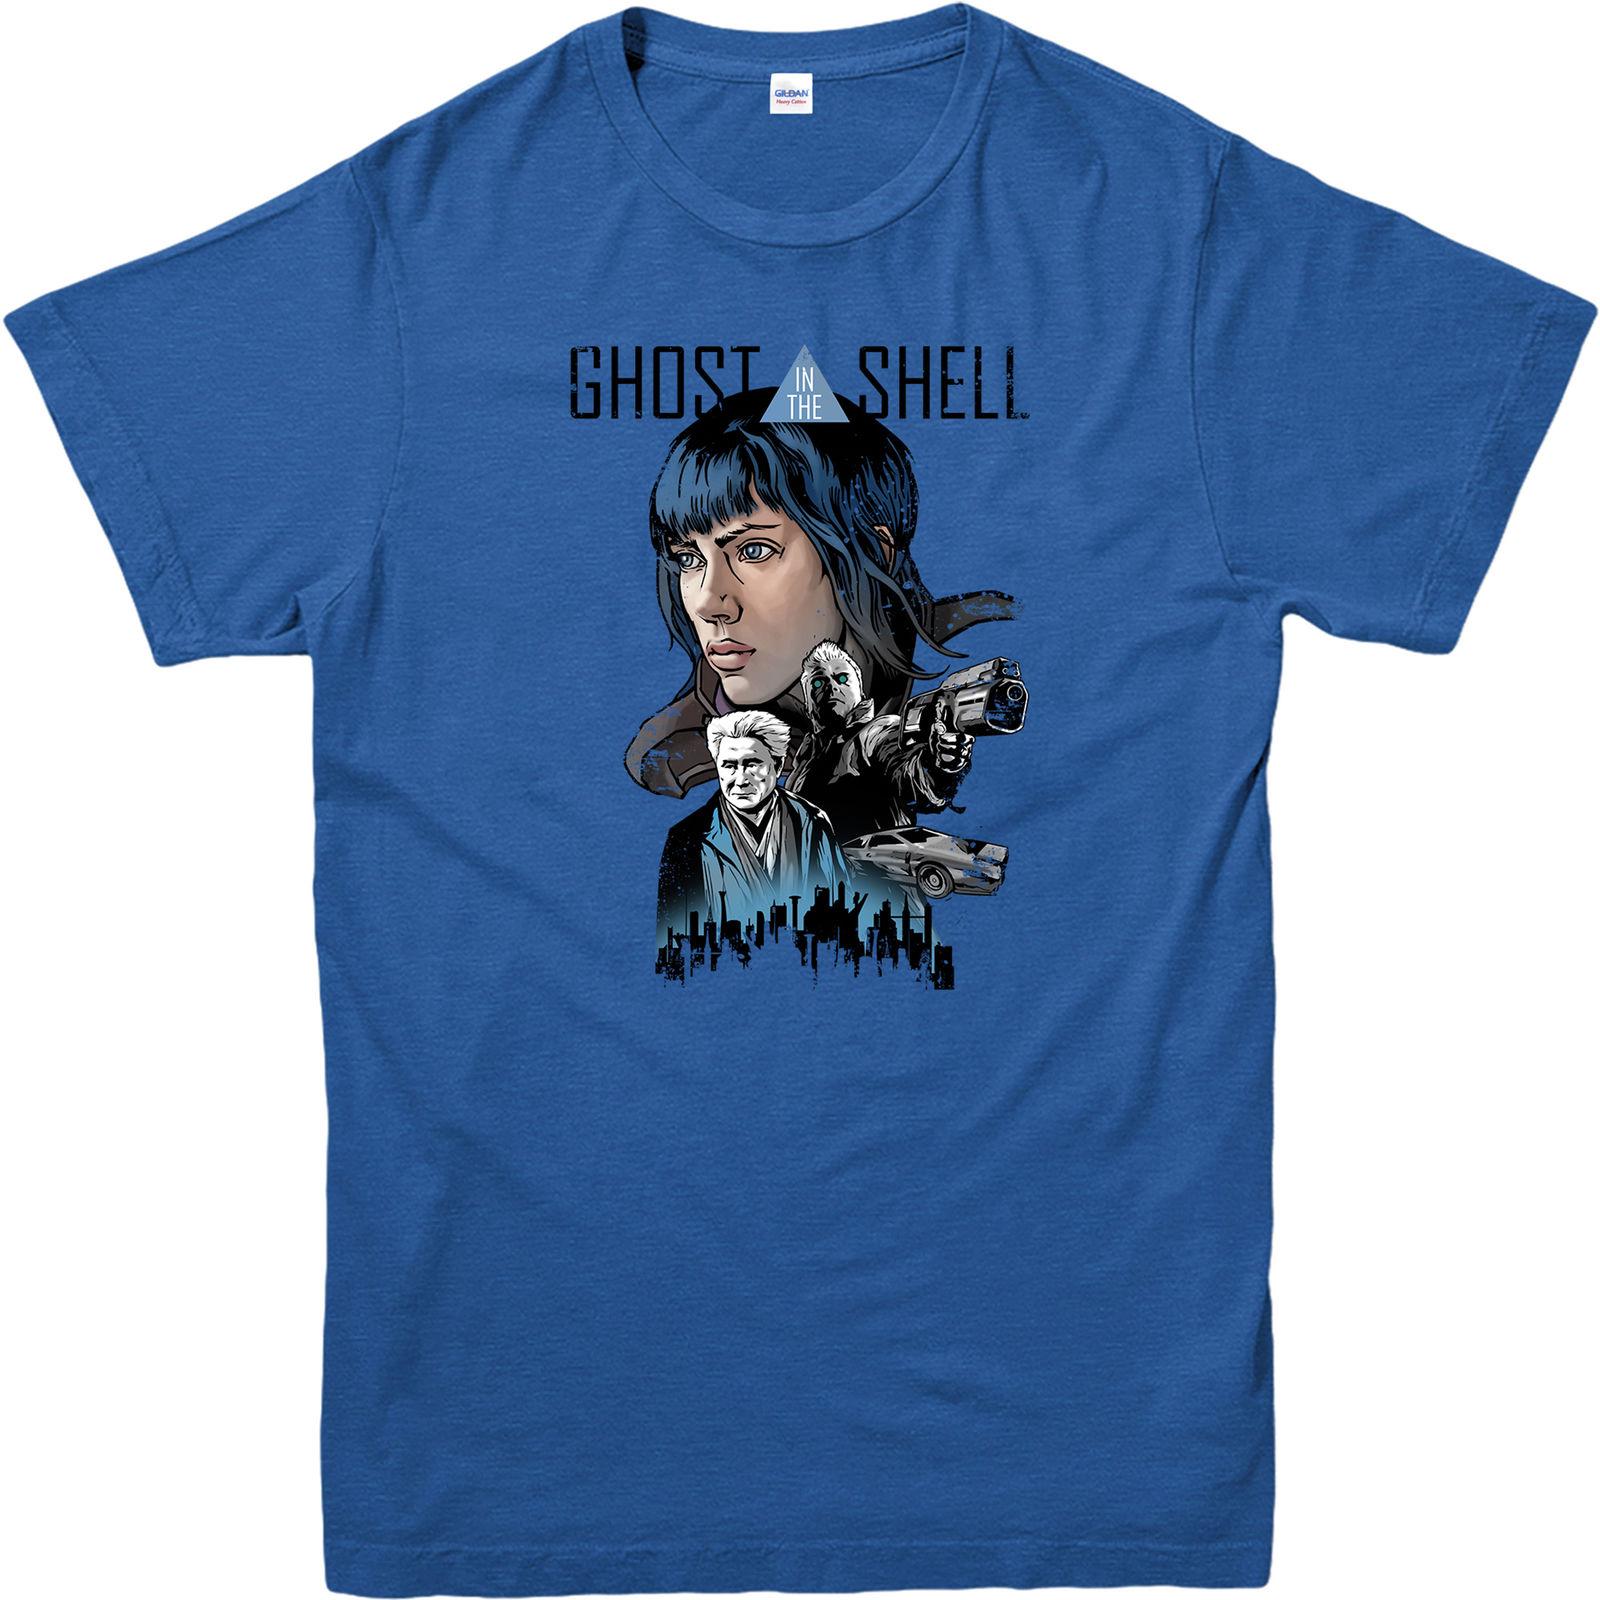 2019 Neueste Brief Drucken Ghost In The Shell Stadt Shkline T-shirt, Manga Anime Japanischen Sci Fi Matrix Top T-shirt Casual Mann Tees Tropf-Trocken